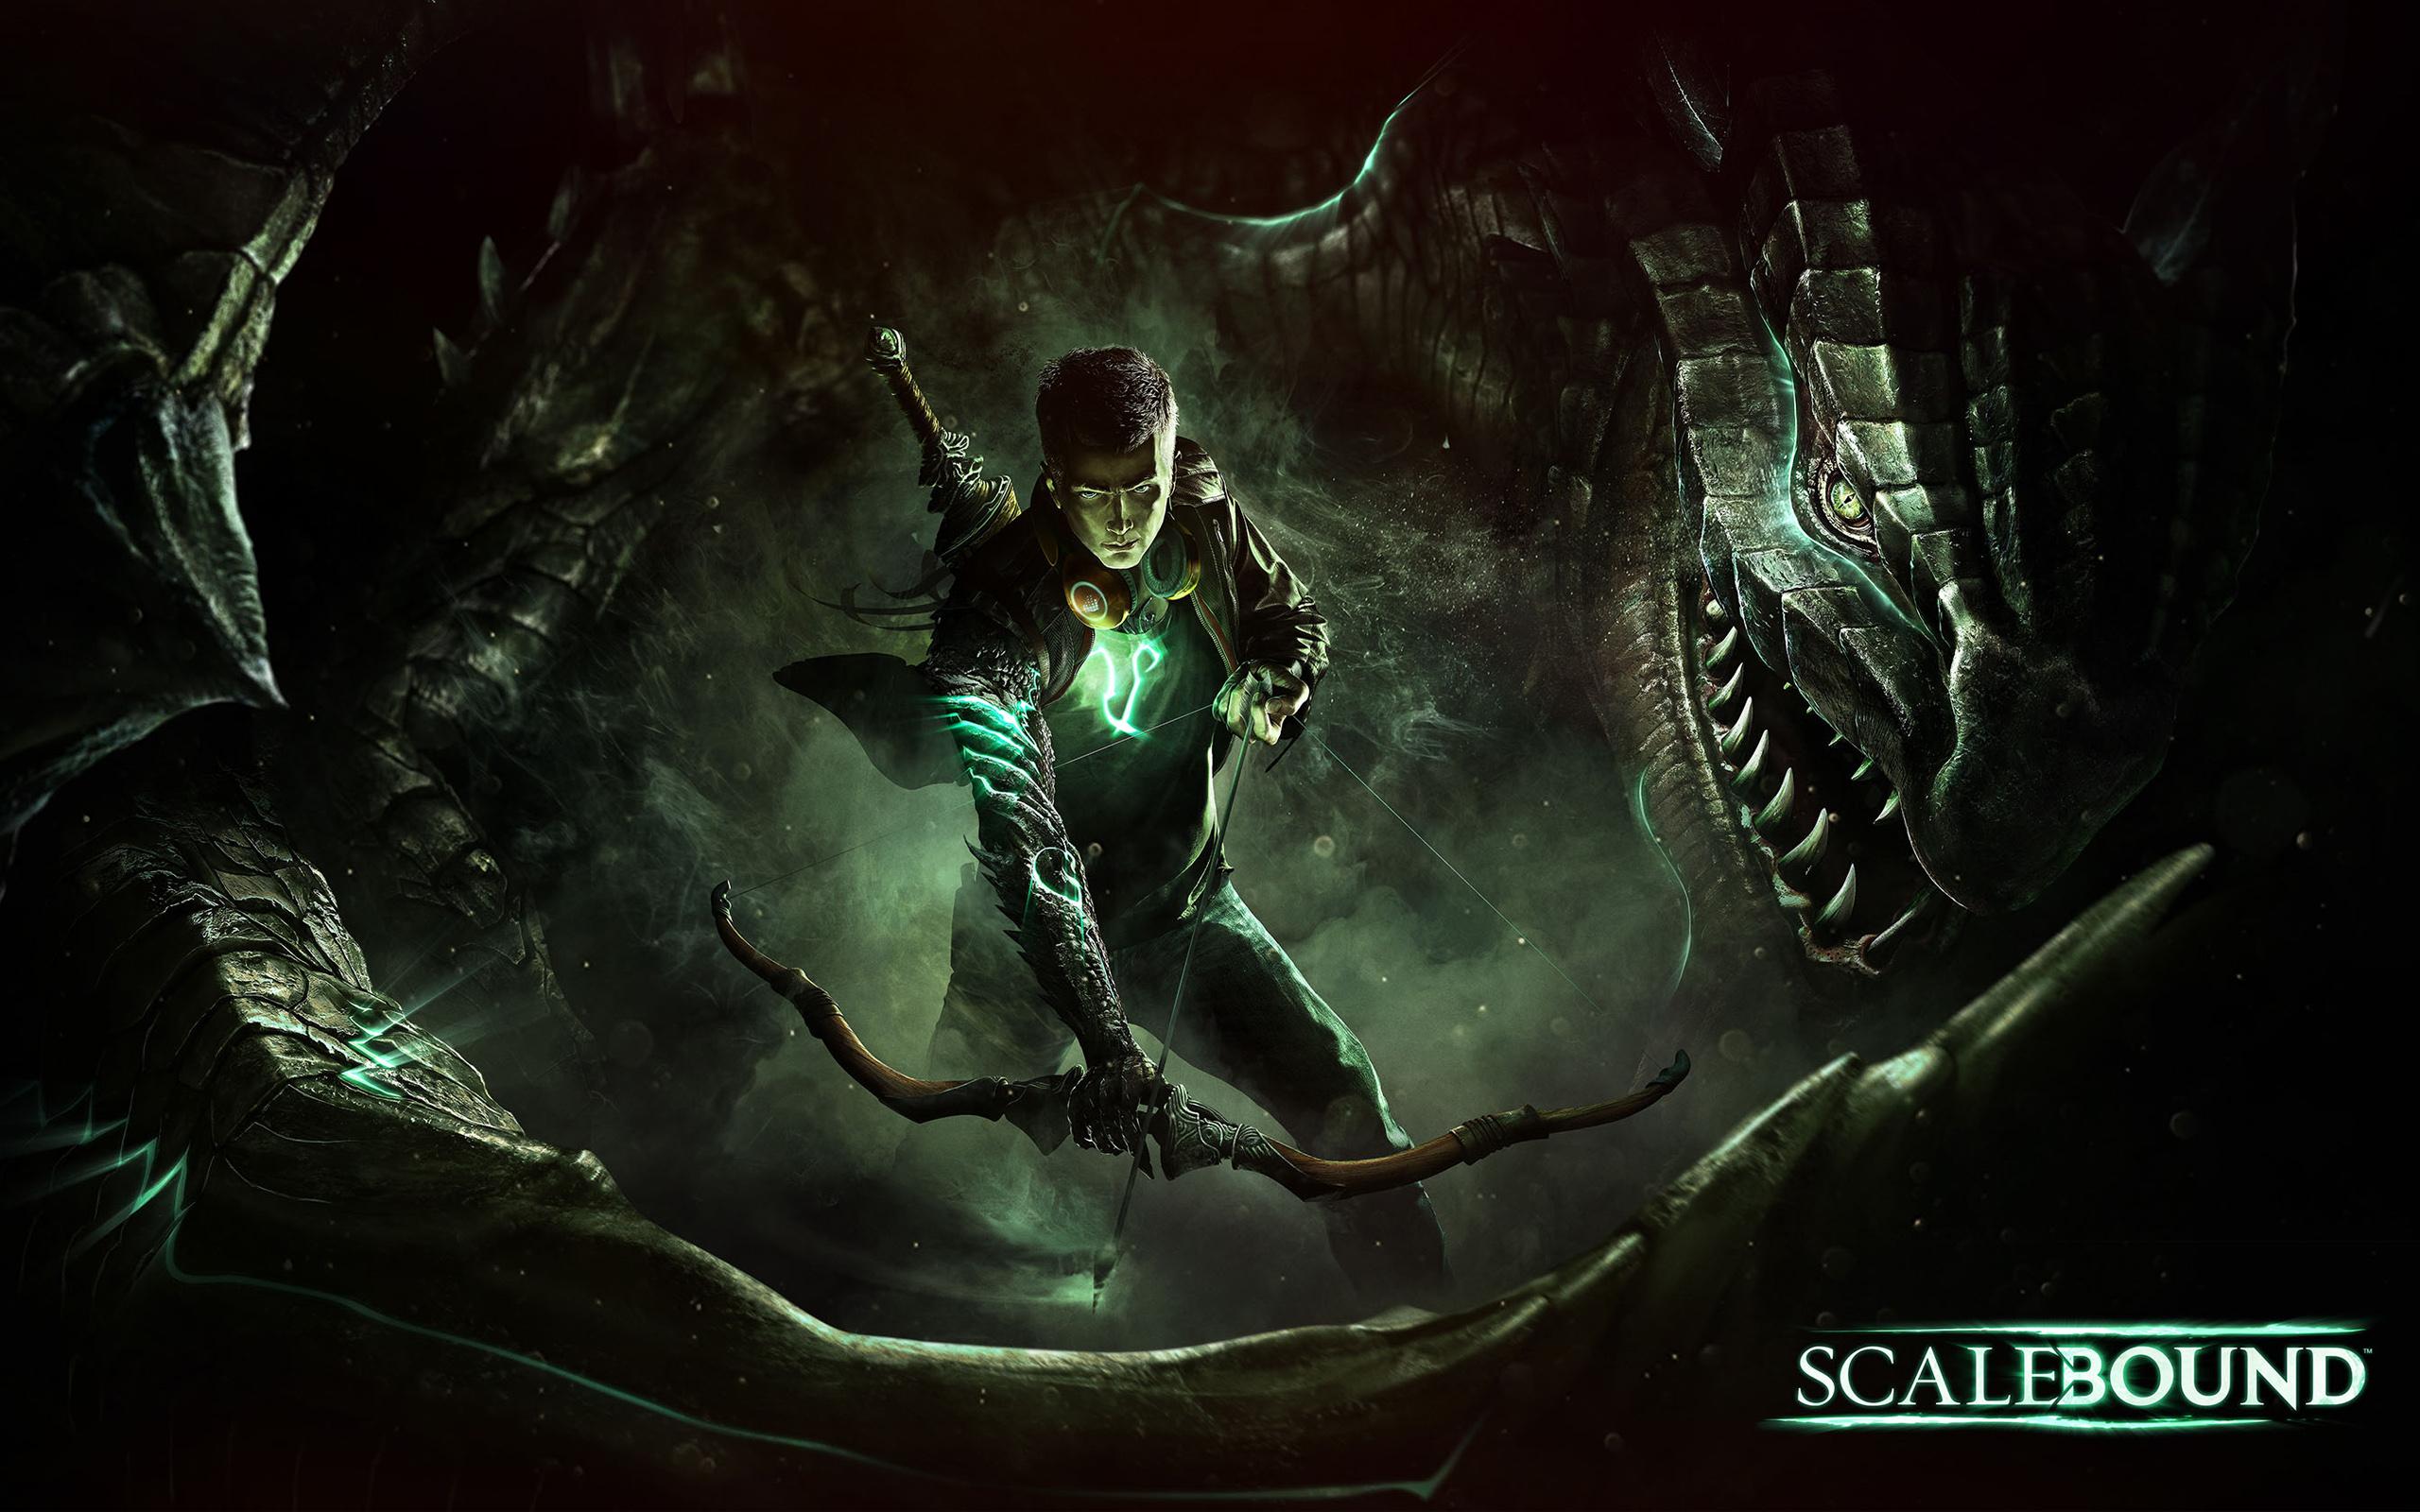 scalebound pc game